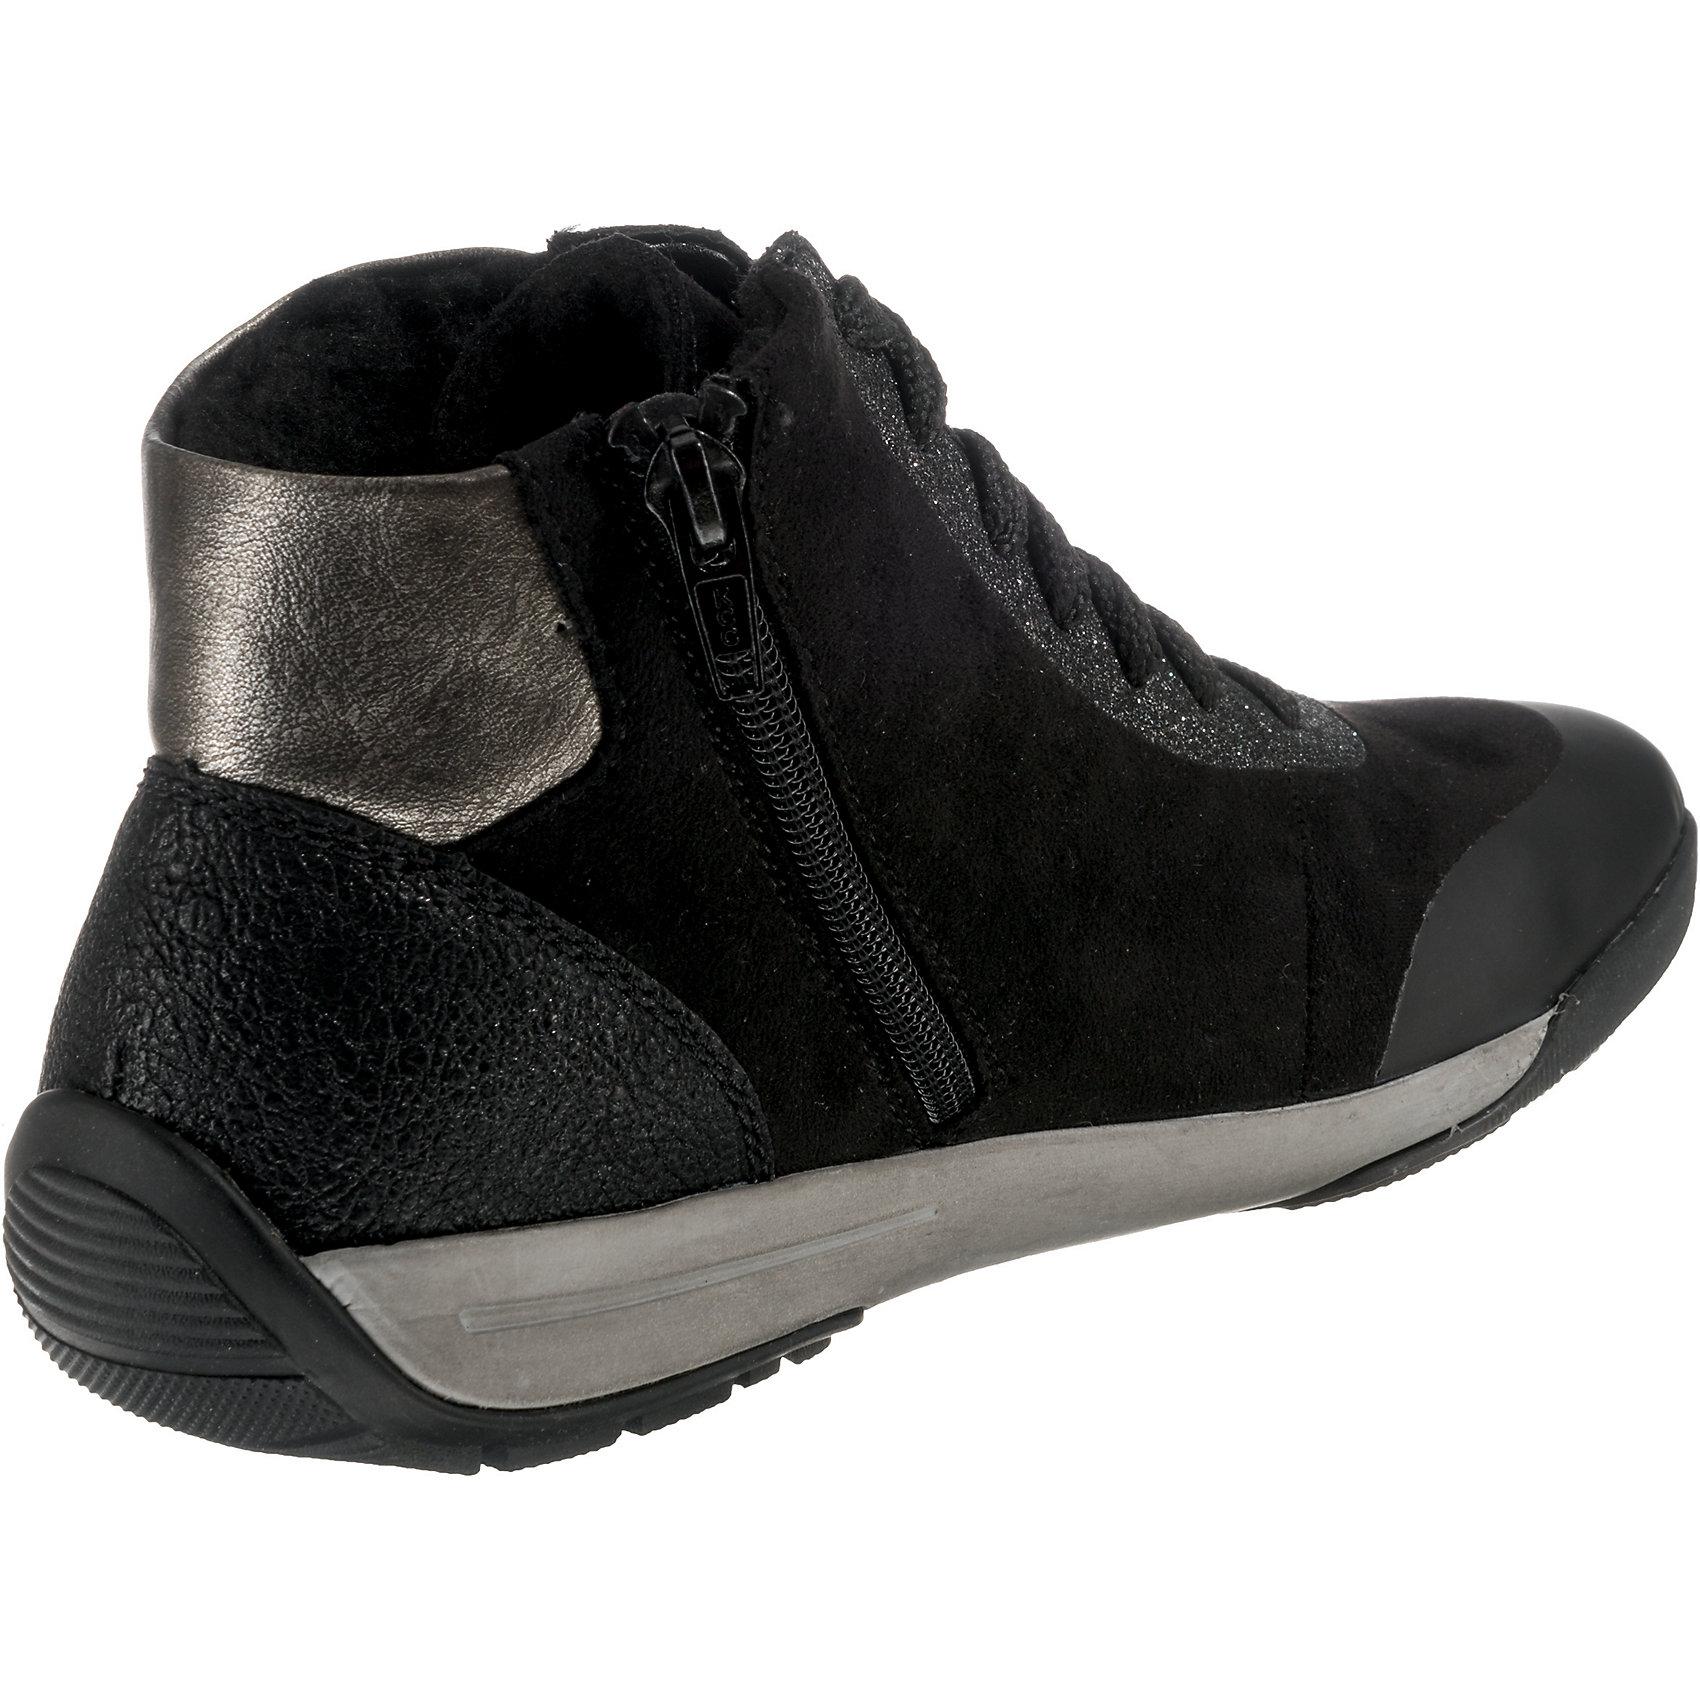 wholesale dealer 14b40 23028 ... New Nike Jordan 1 Flight 5 Prem Prem Prem Men s Basketball Shoes Black  881434 020 b28ccd ...